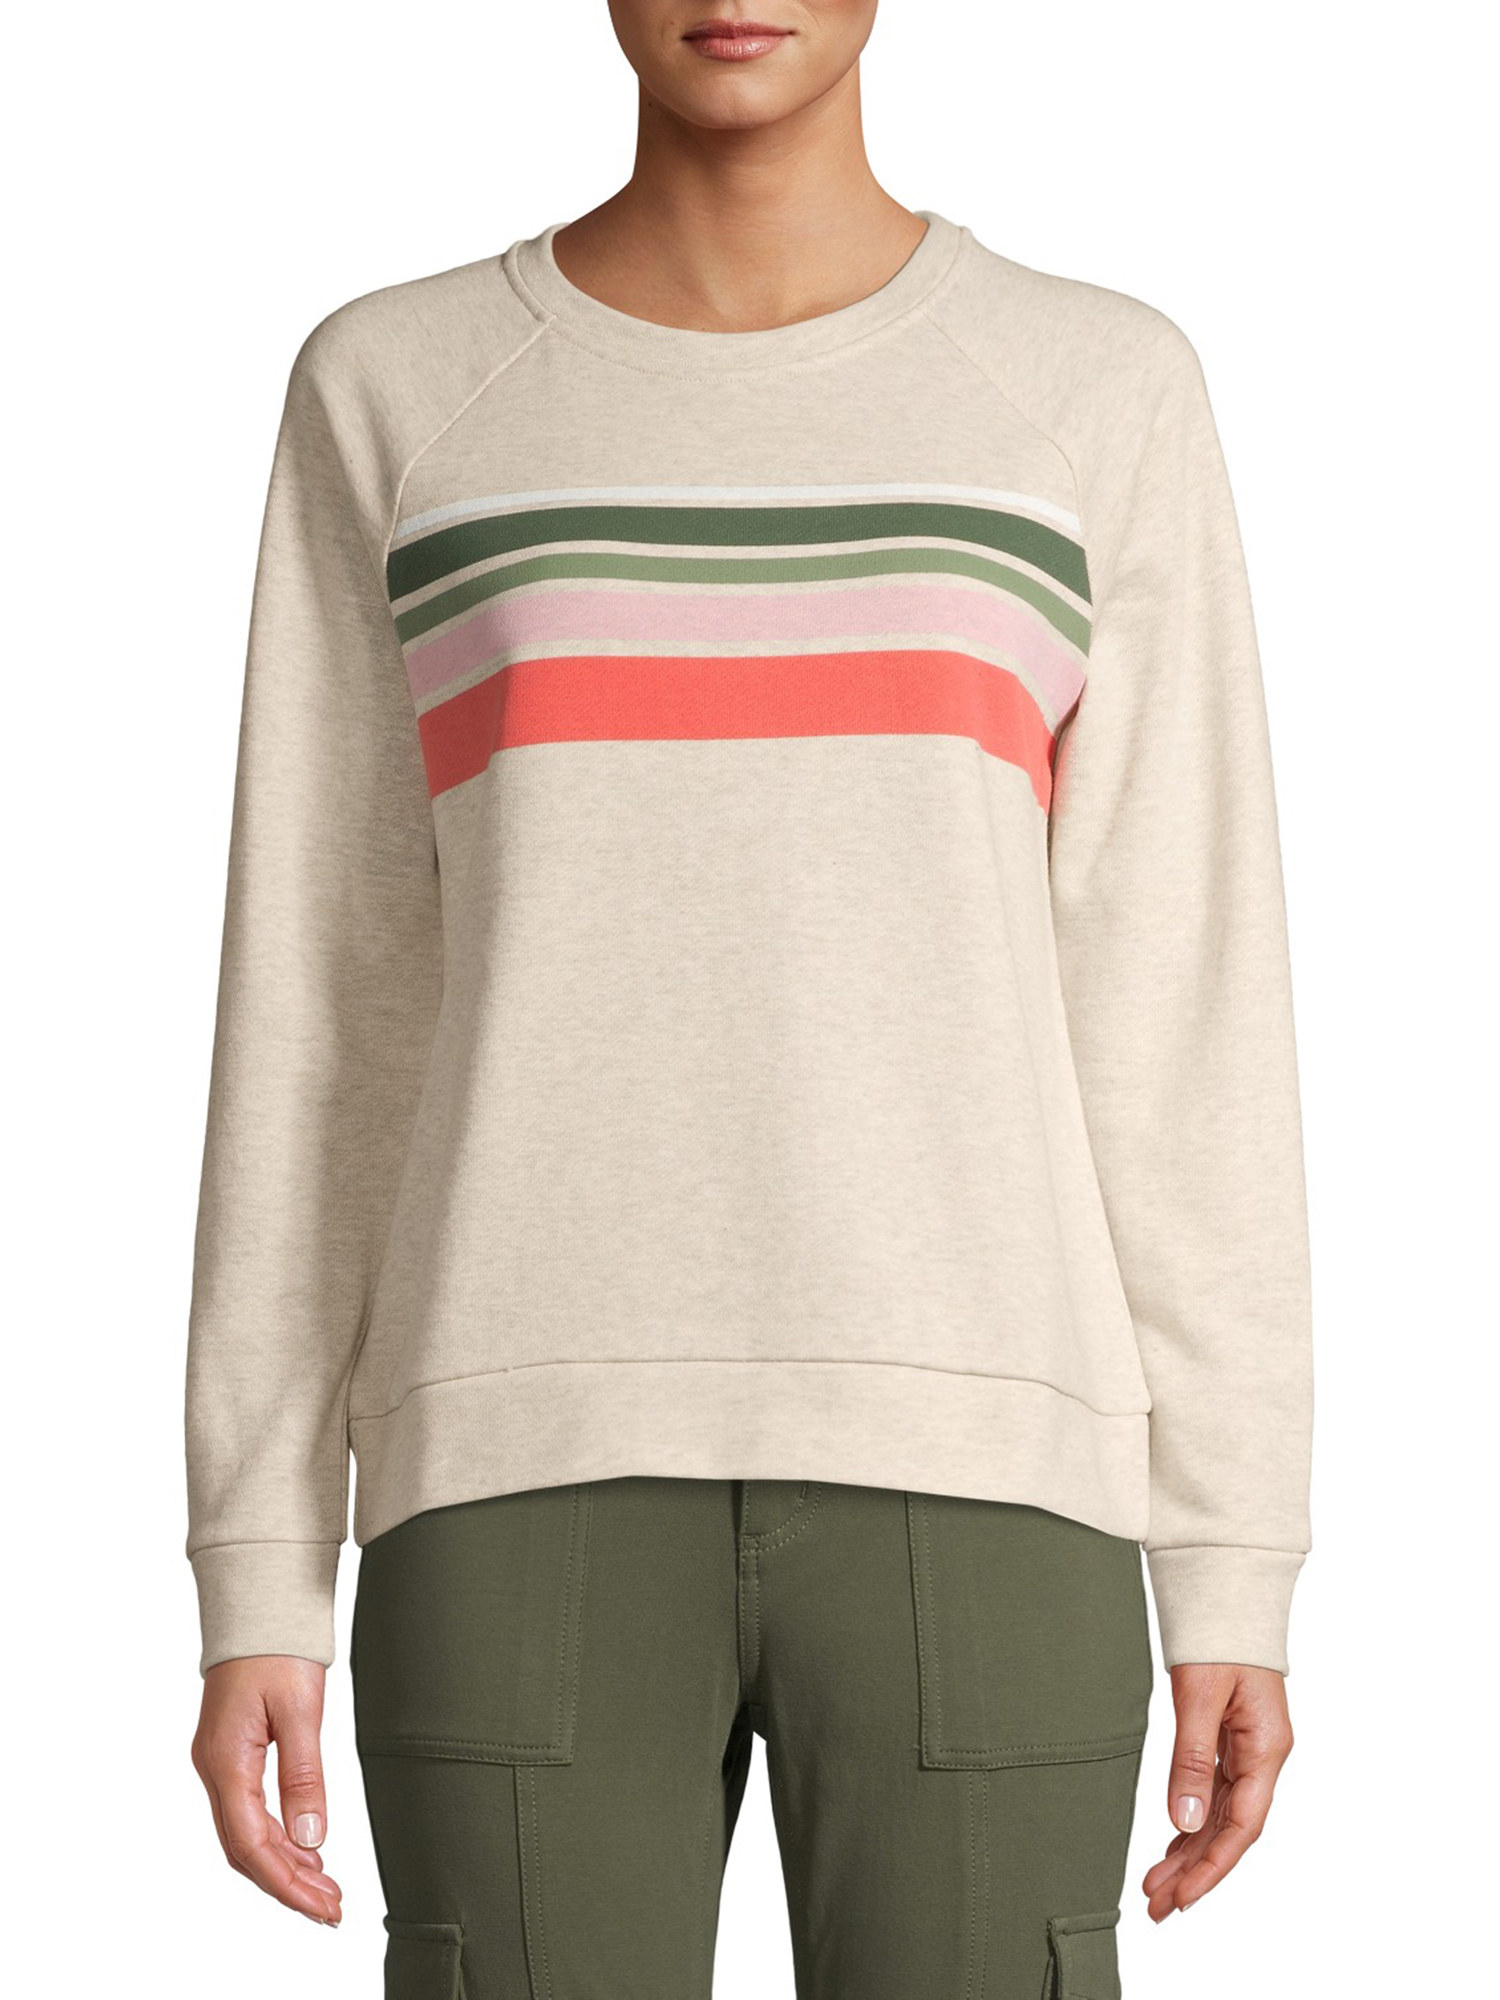 Model wearing the heather sweater